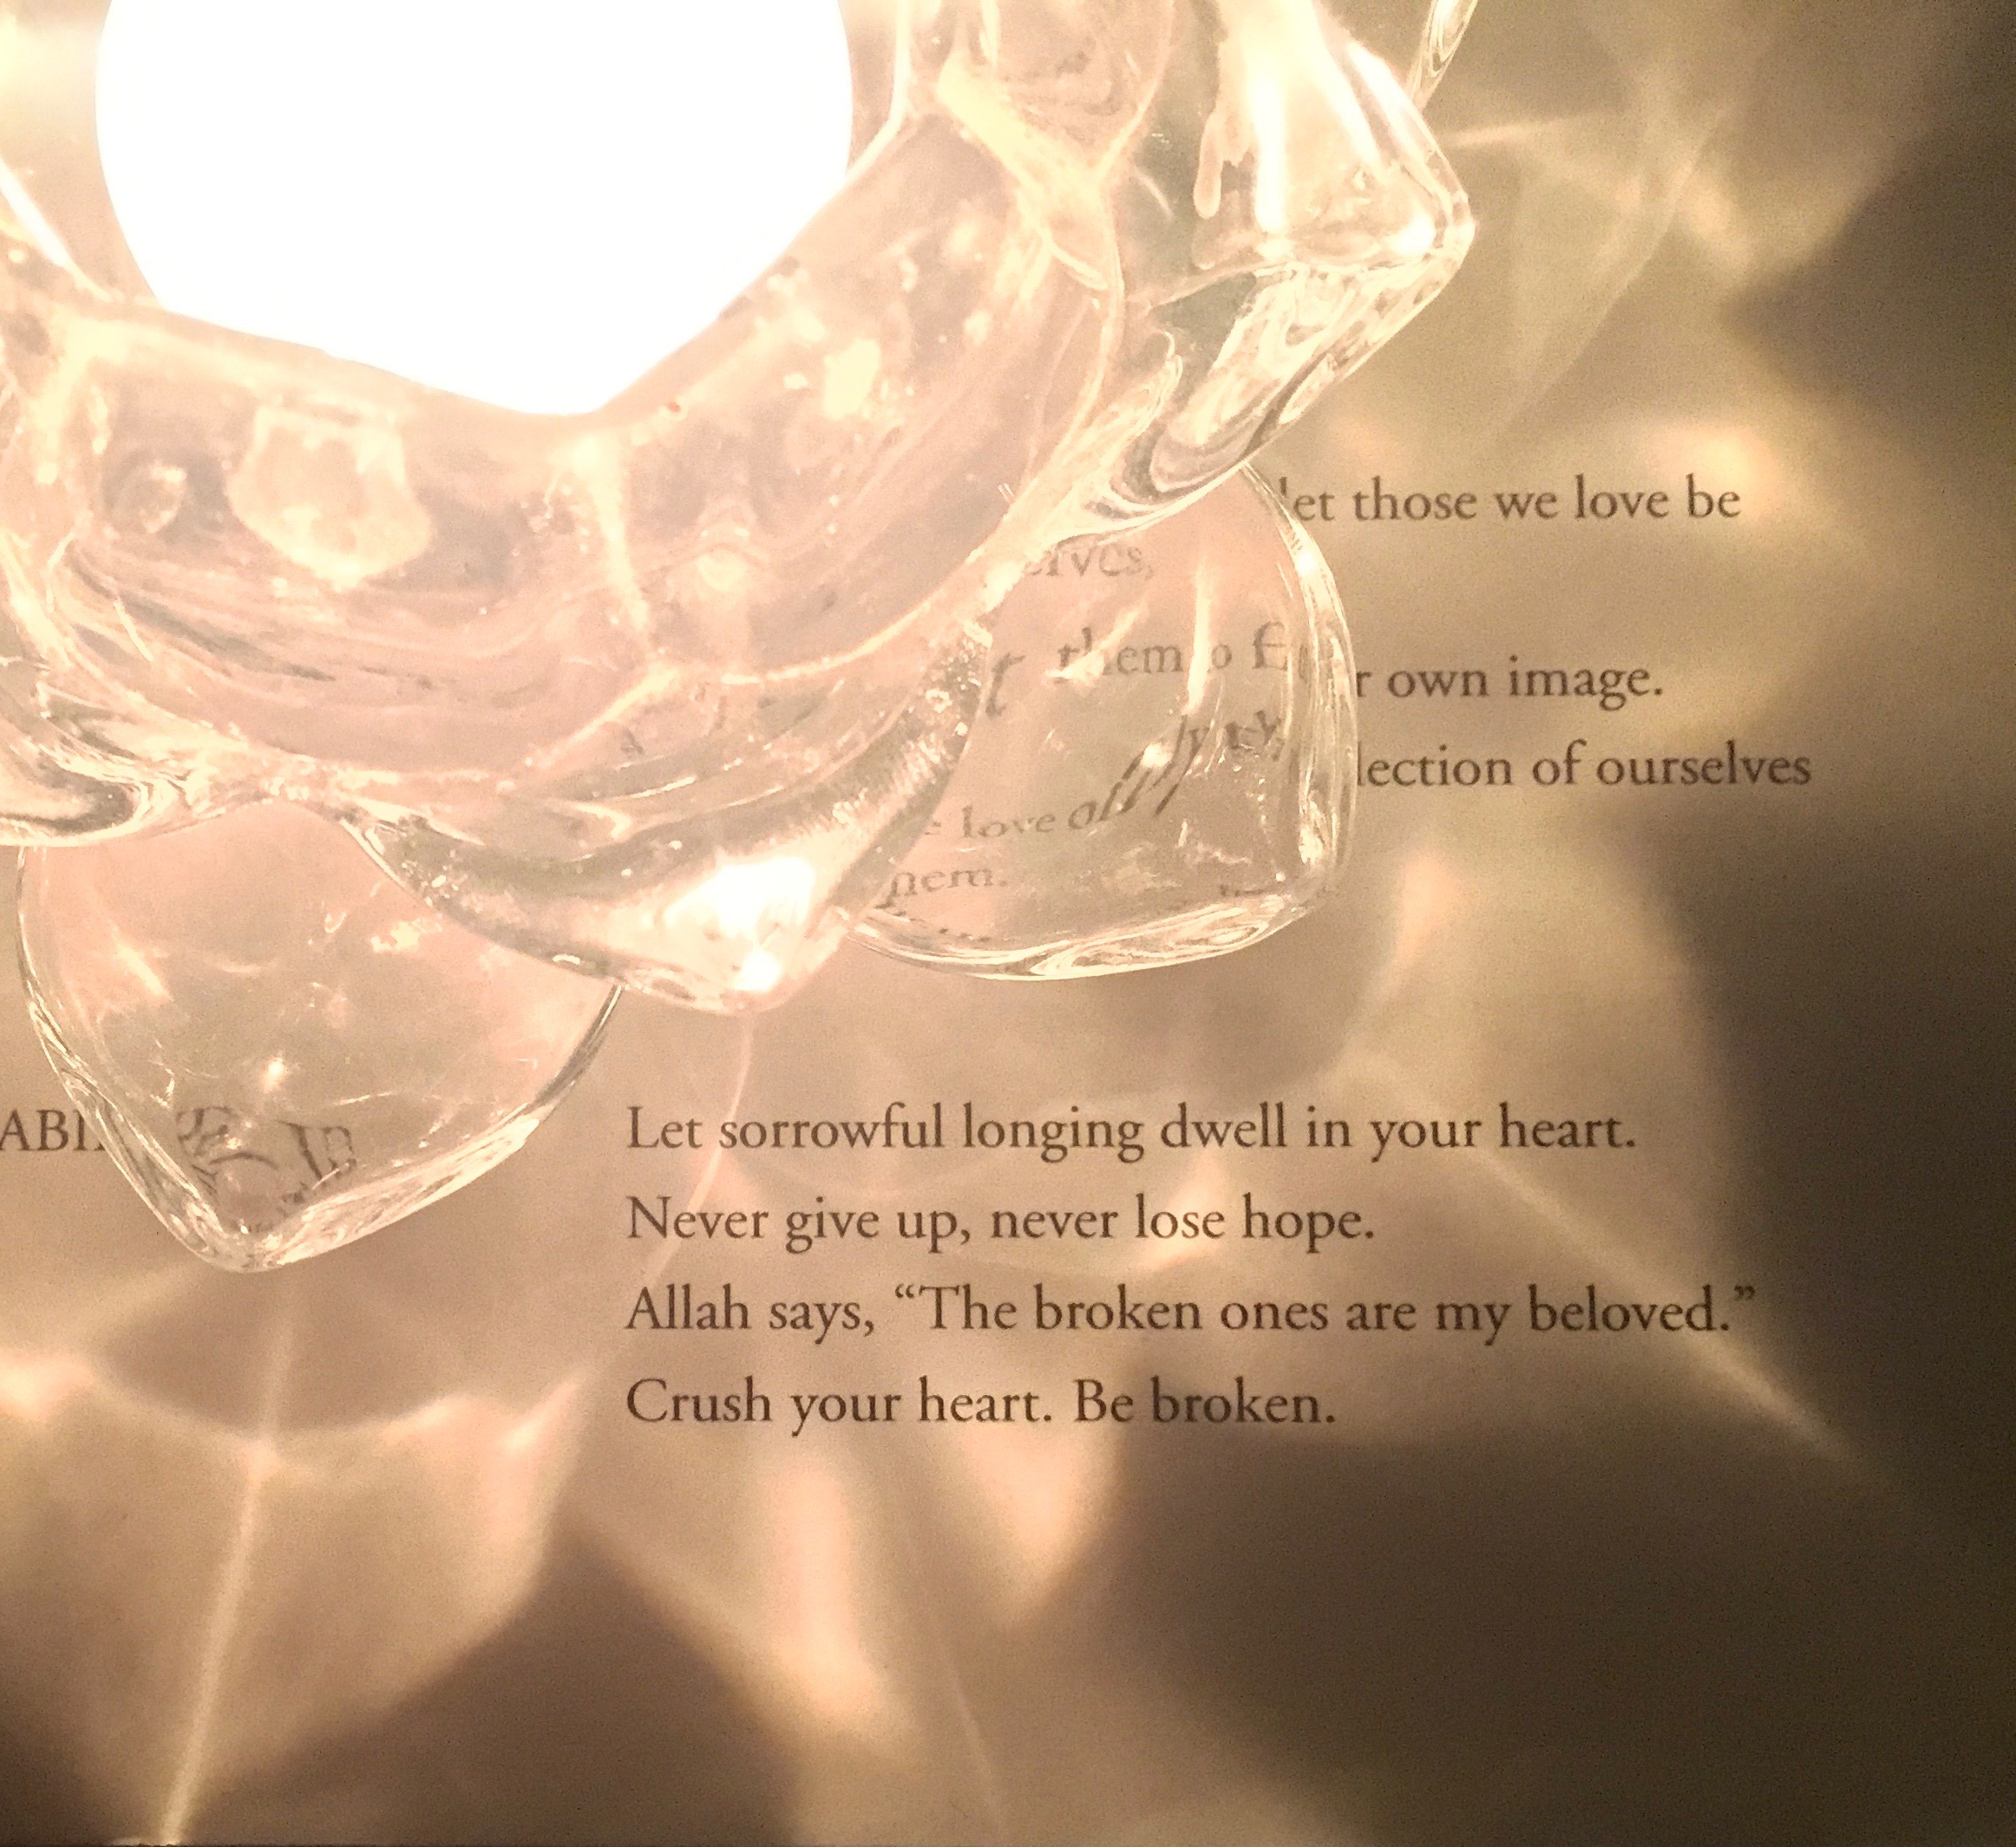 Poem by  Sheikh Abu Saeed Abil Kheir